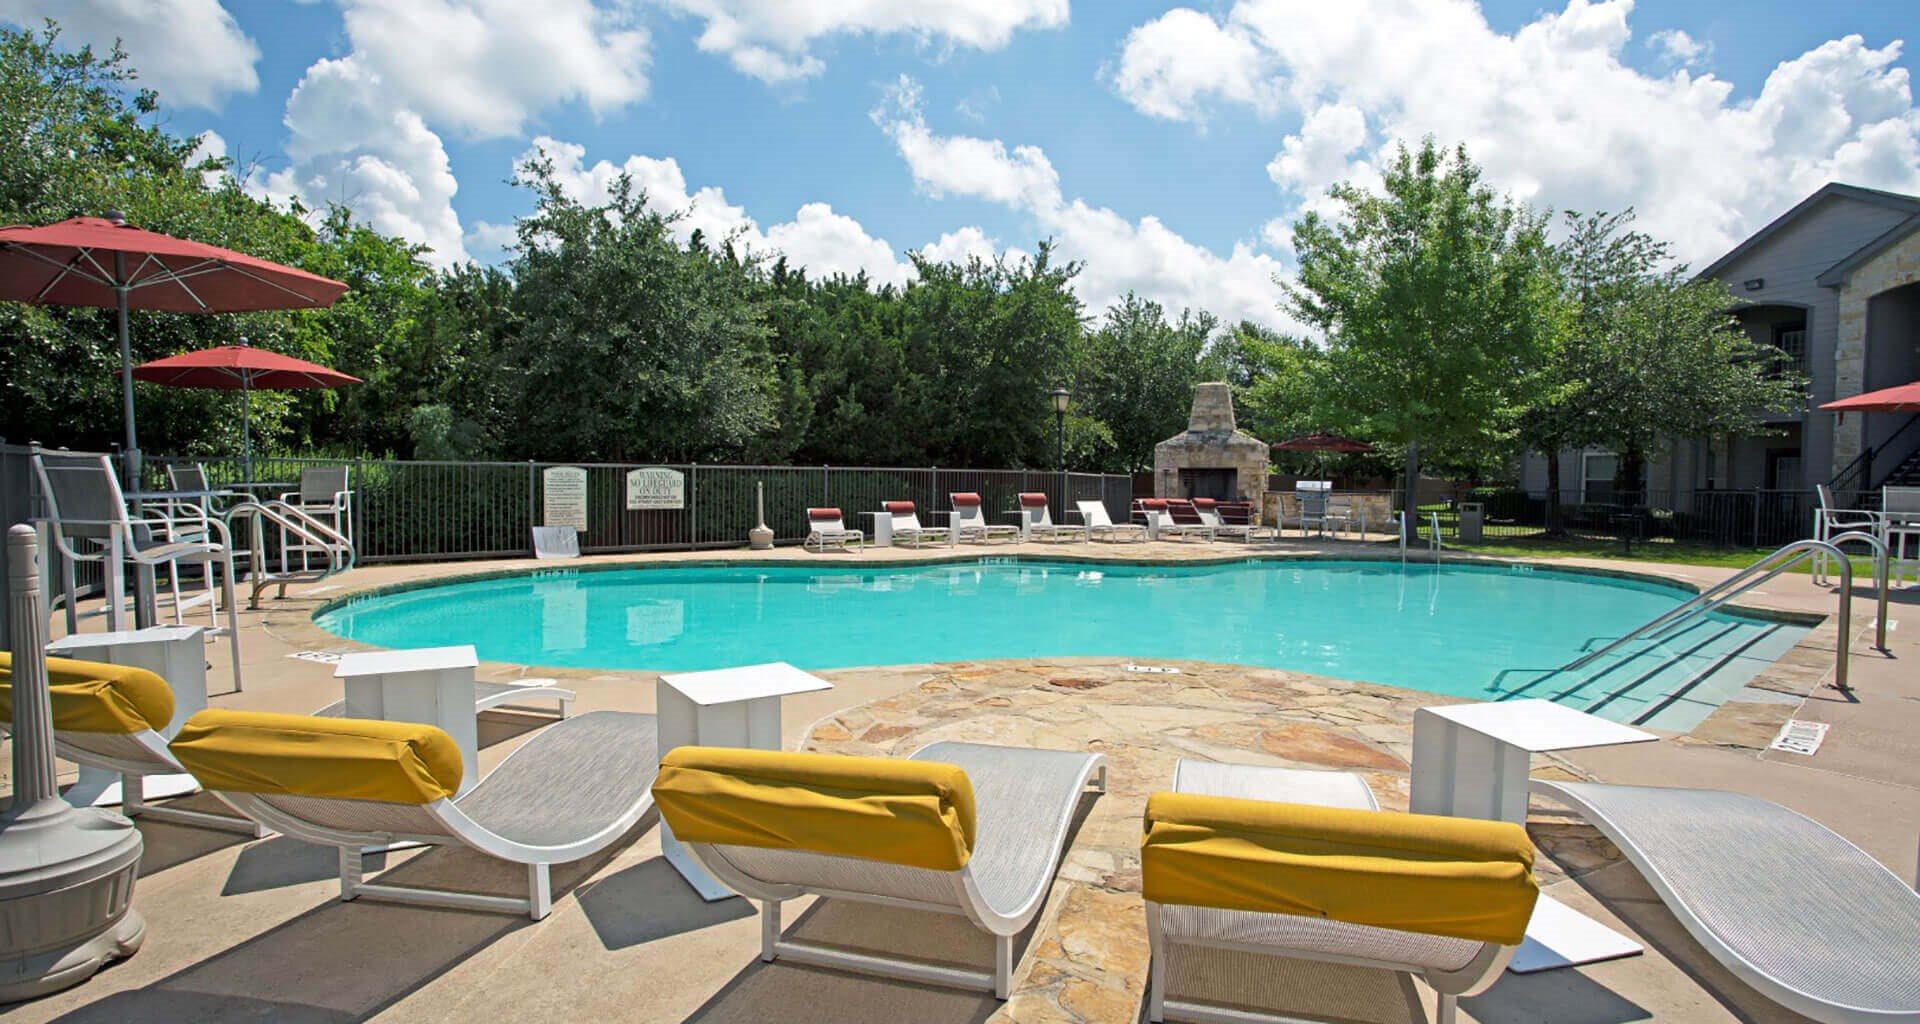 Swimming Pool and Lounge at at Saddle Creek & The Cove, Austin, TX, 78748